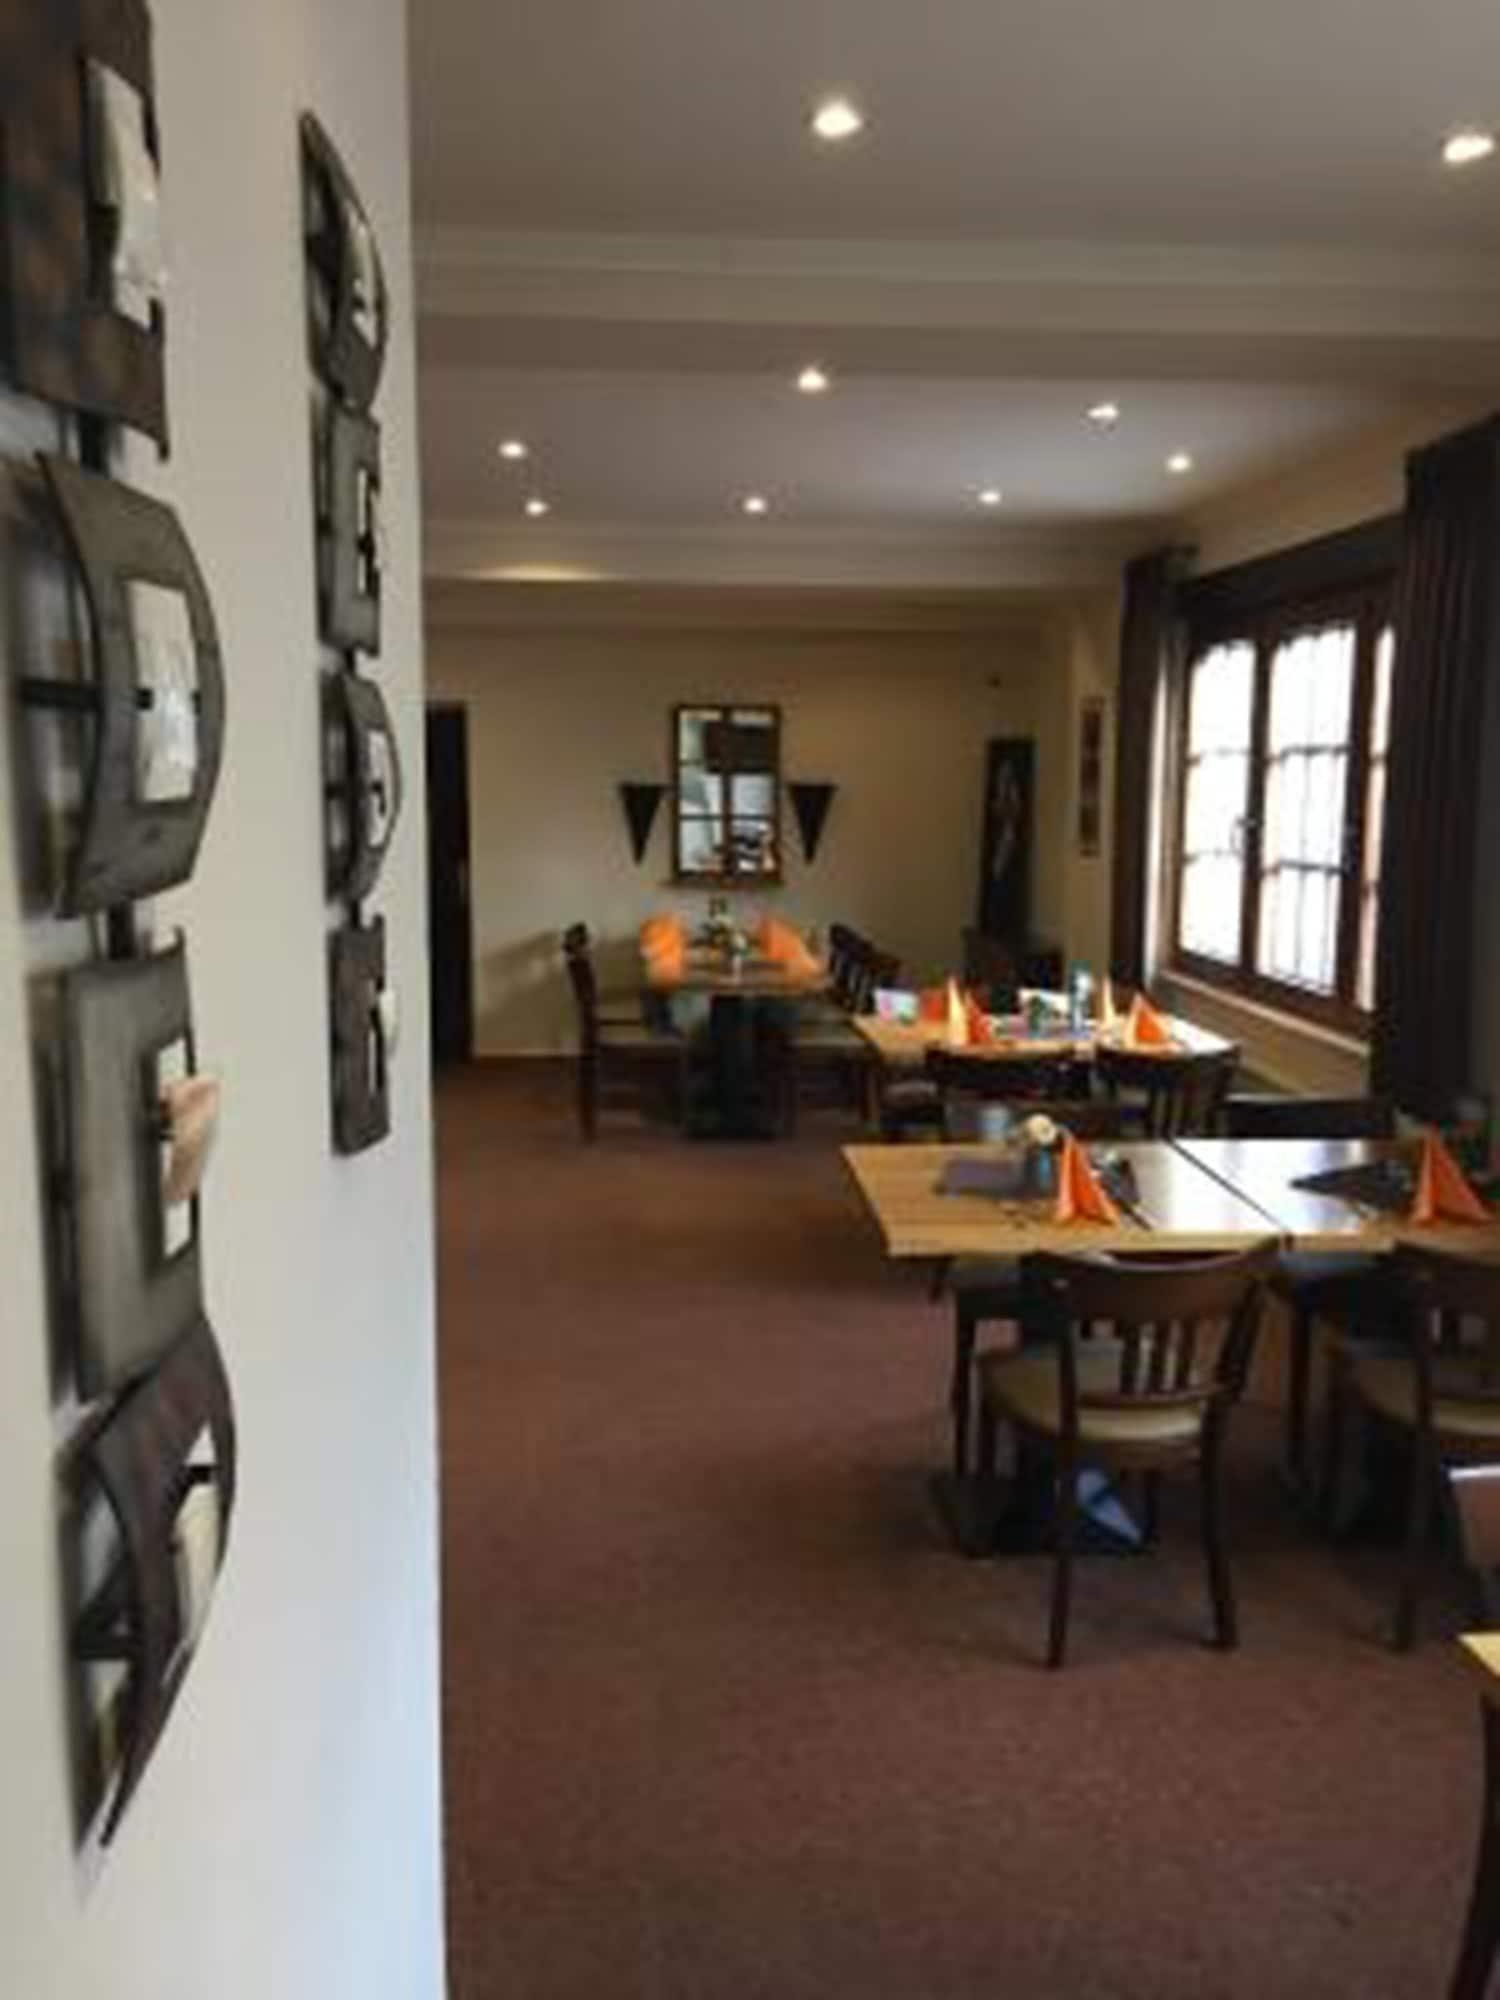 Hotel Burgklause, Mayen-Koblenz